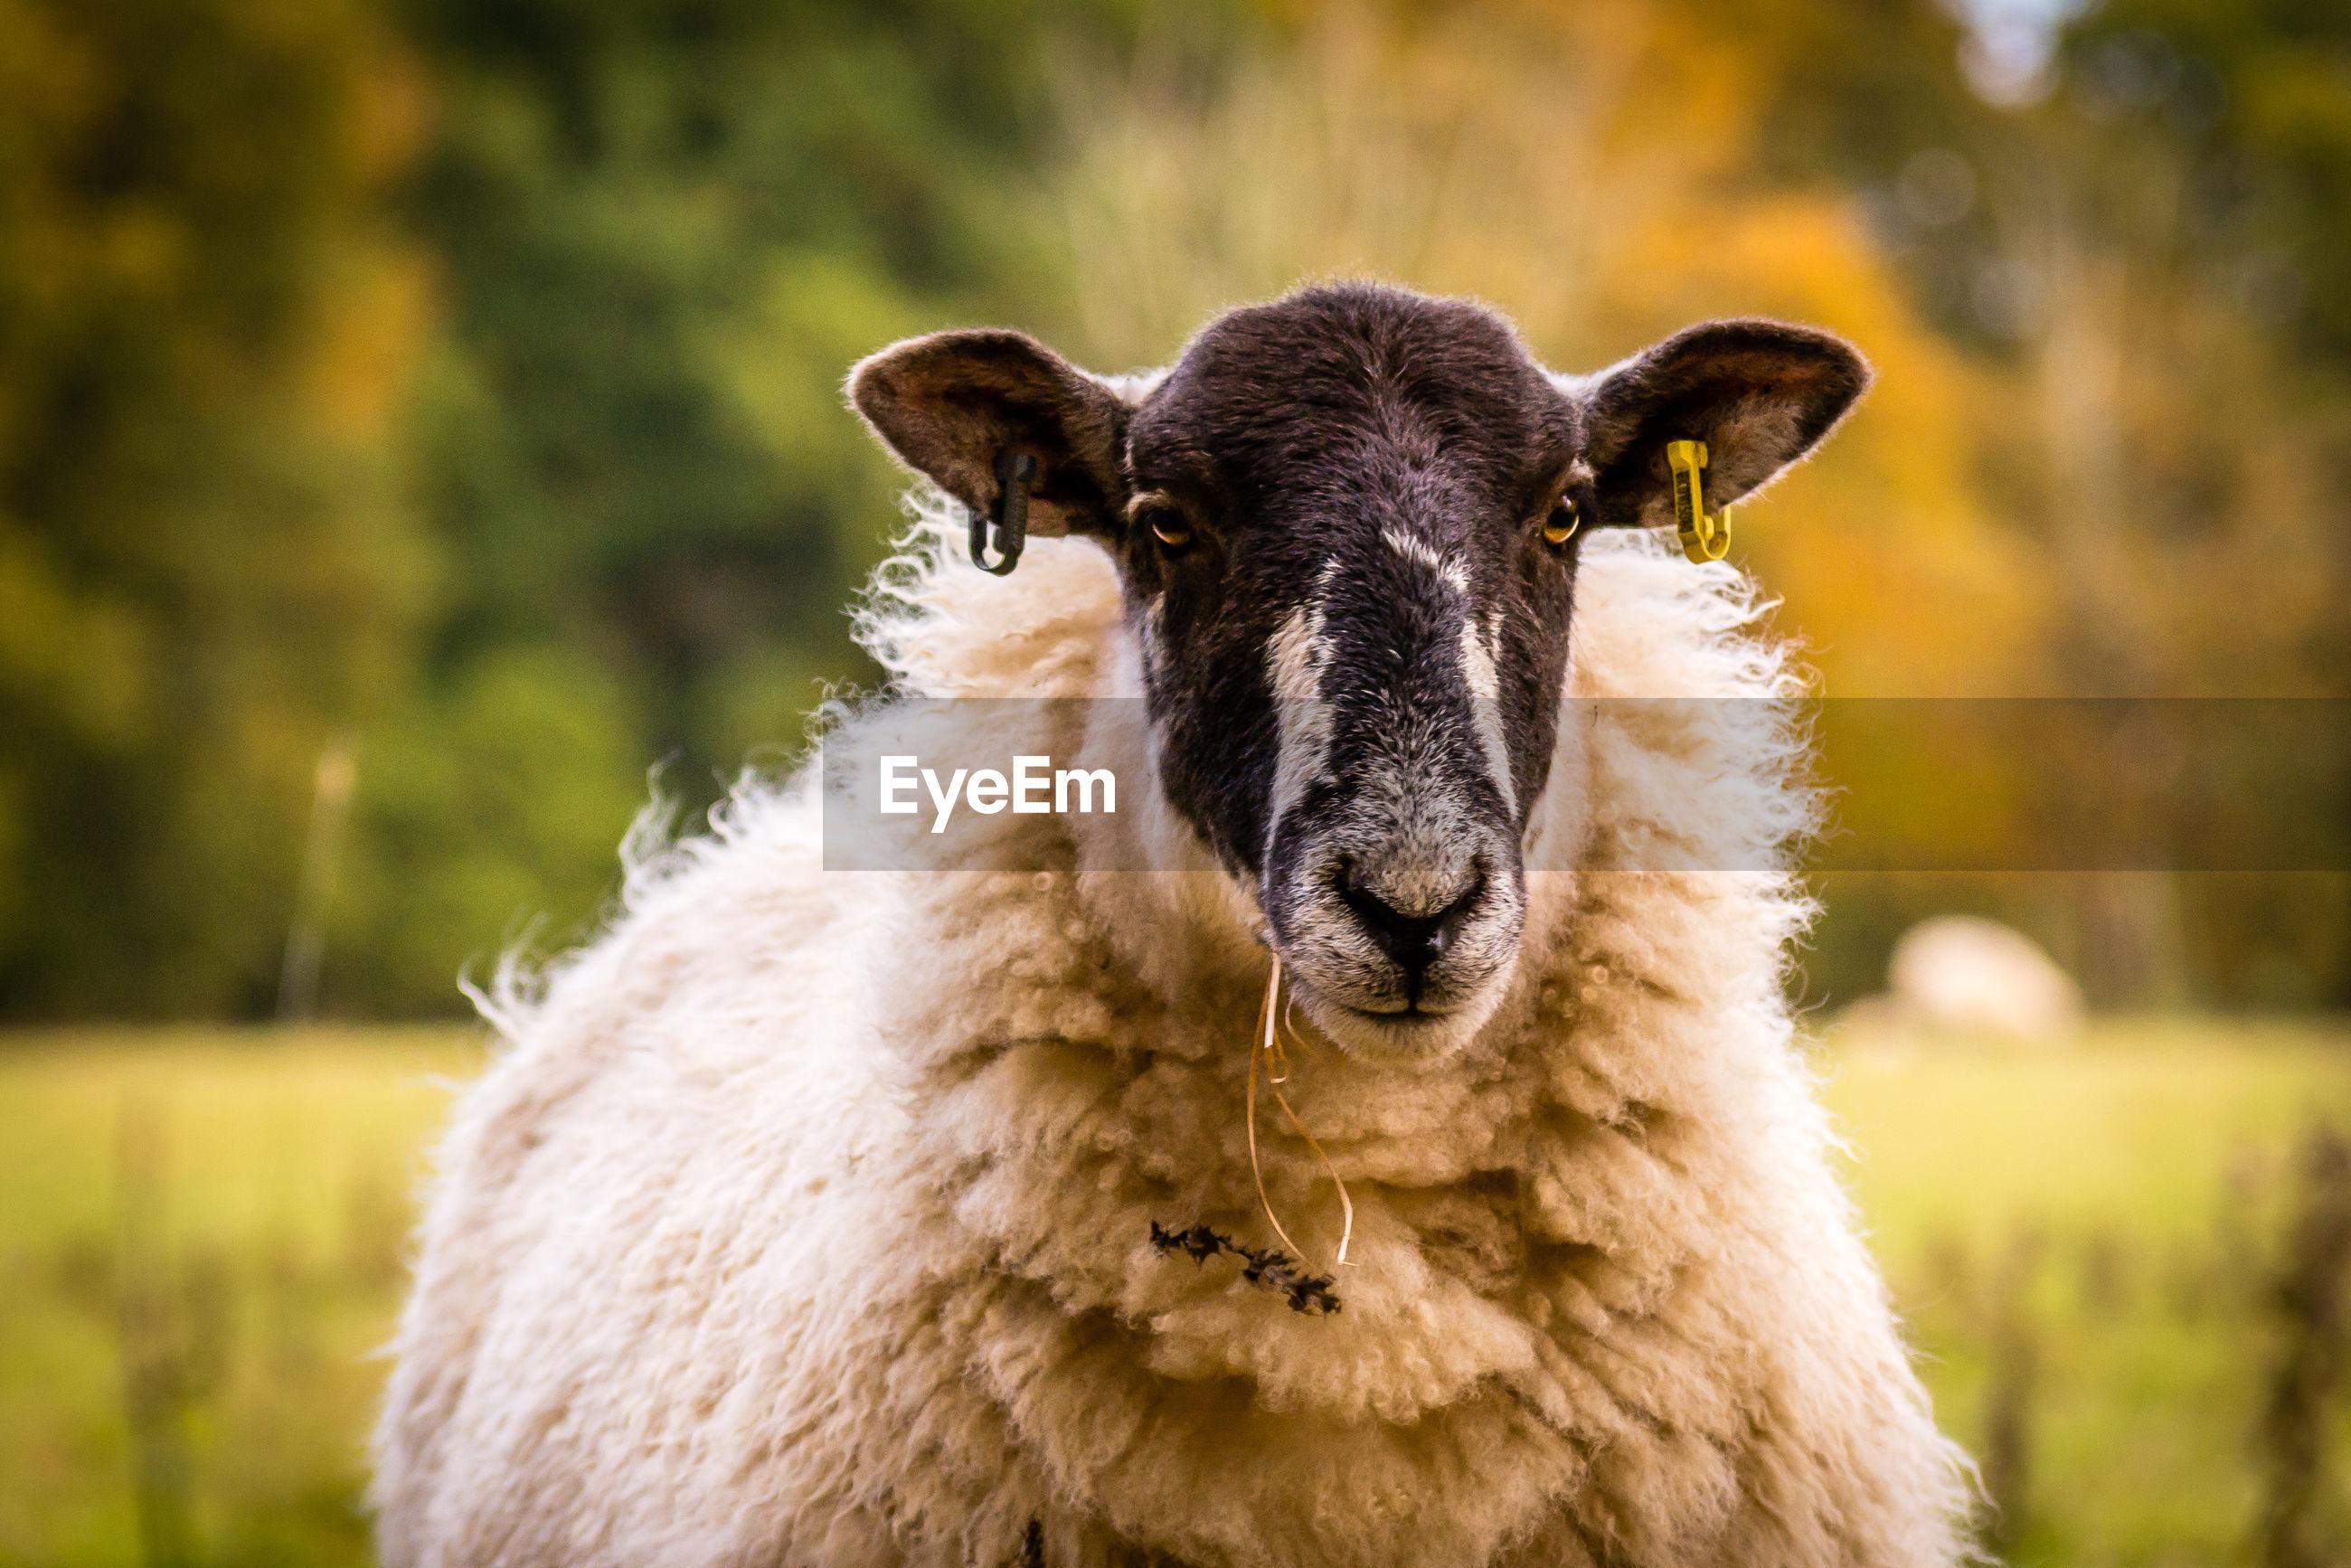 Close-up portrait of a sheep